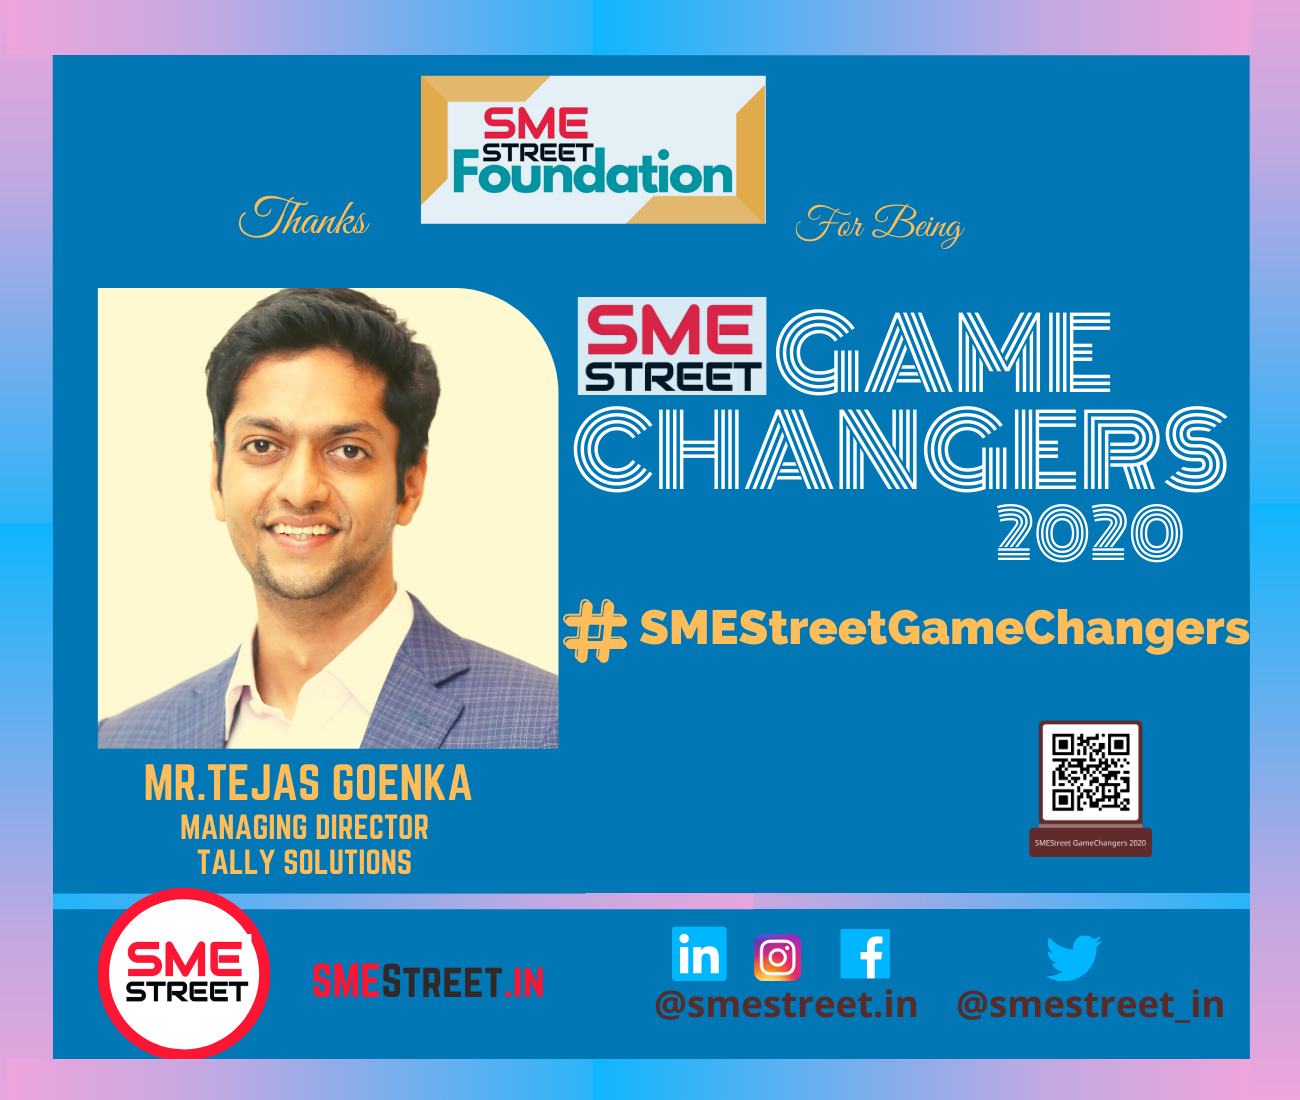 SMEStreet GameChangers, Tally Solutions, Tejas Goenka, SMESTreet, Faiz Askari